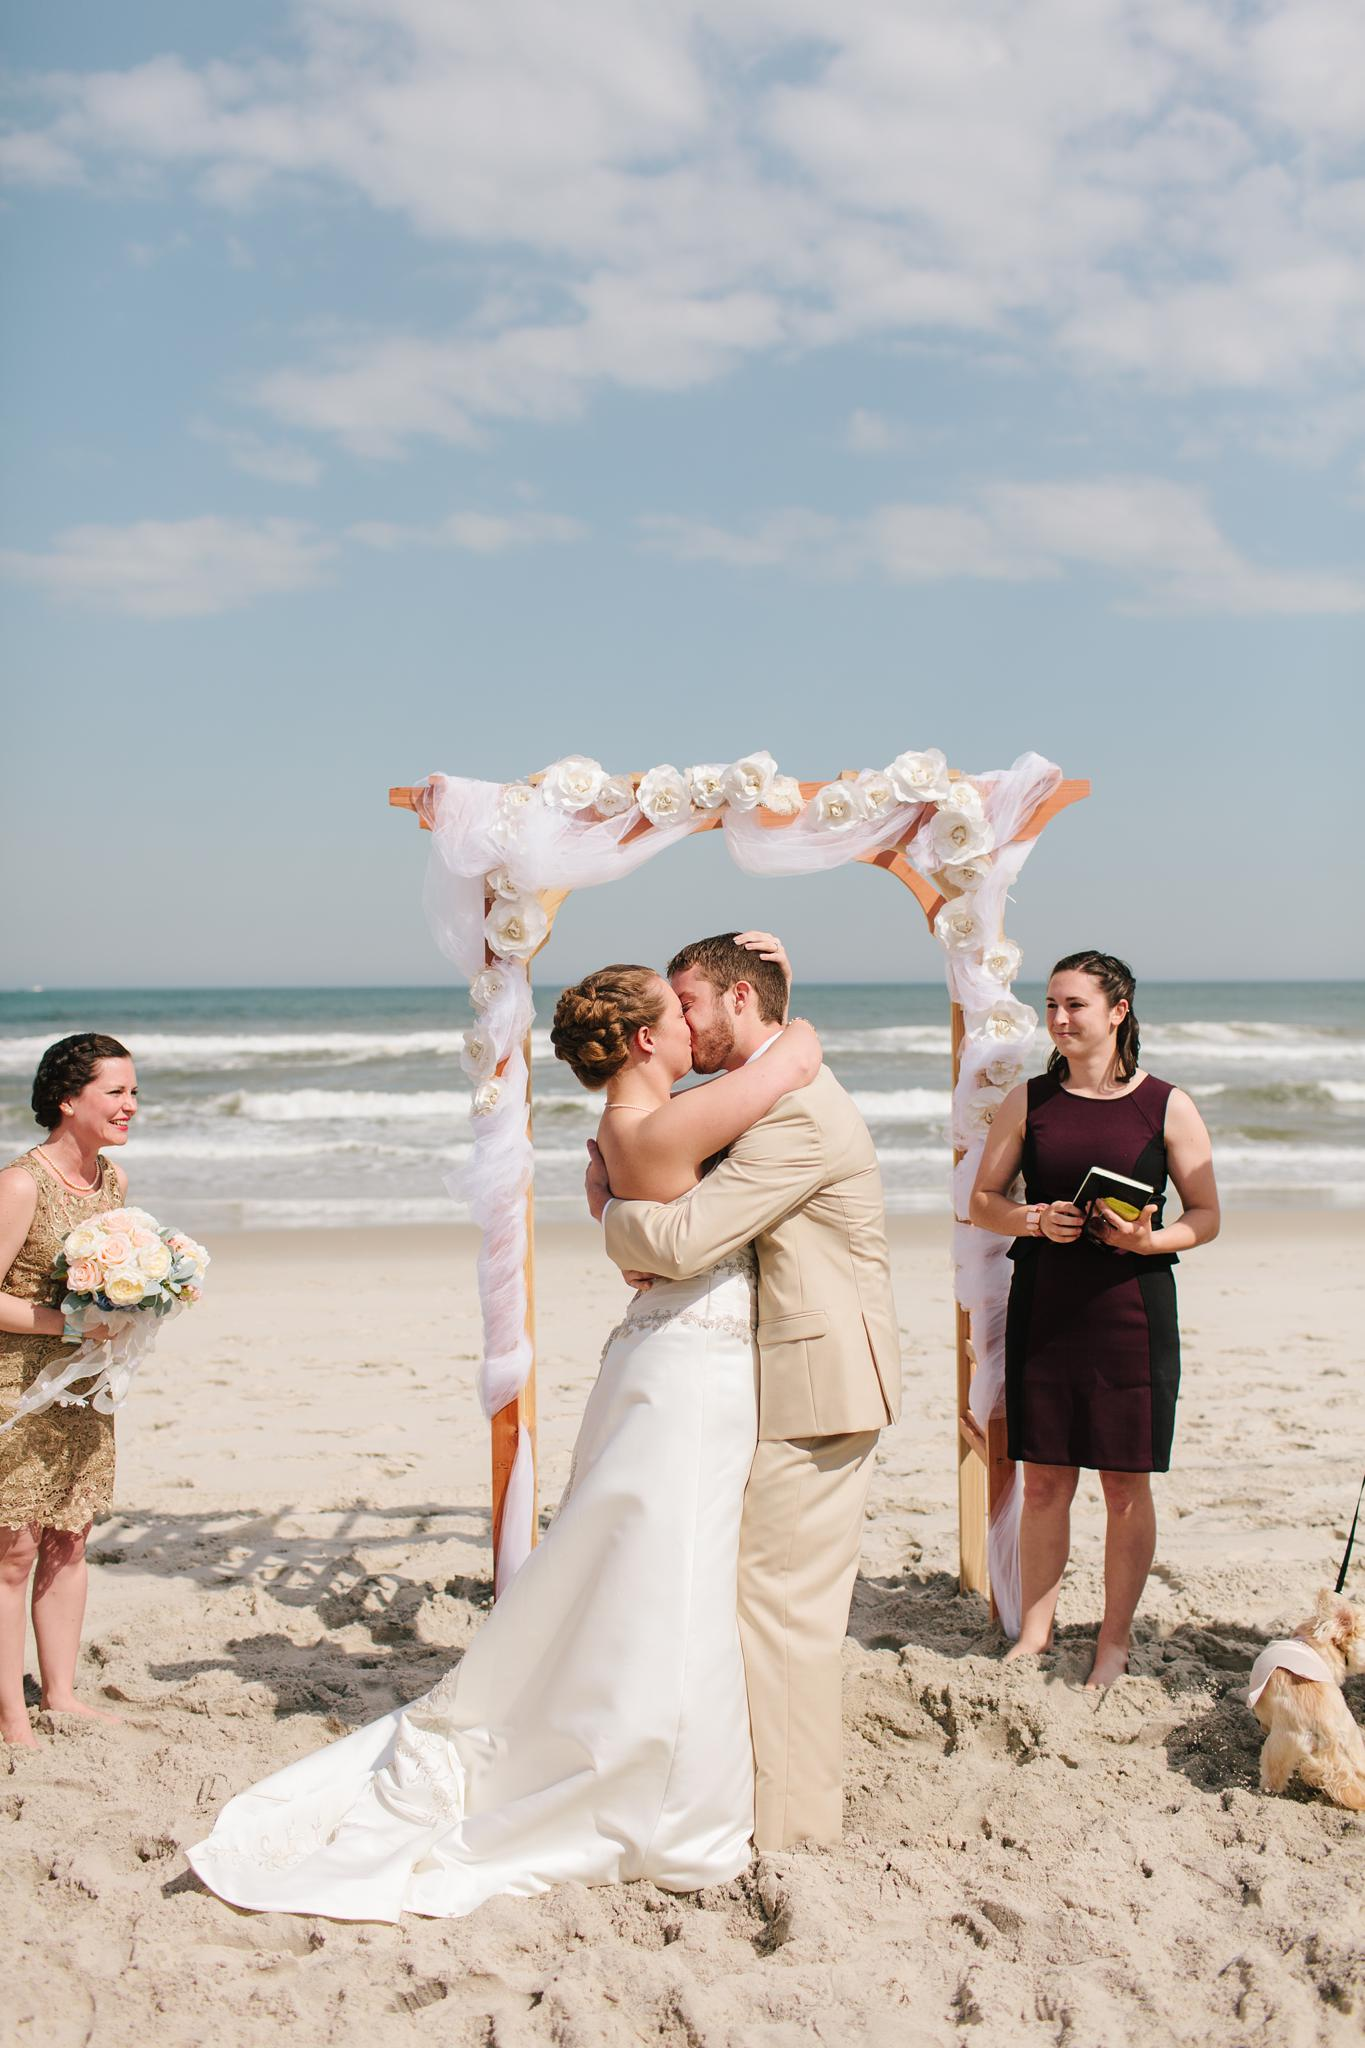 brant_beach_yacht_club_wedding_long_beach_island_nj_wedding_photographer_487.jpg